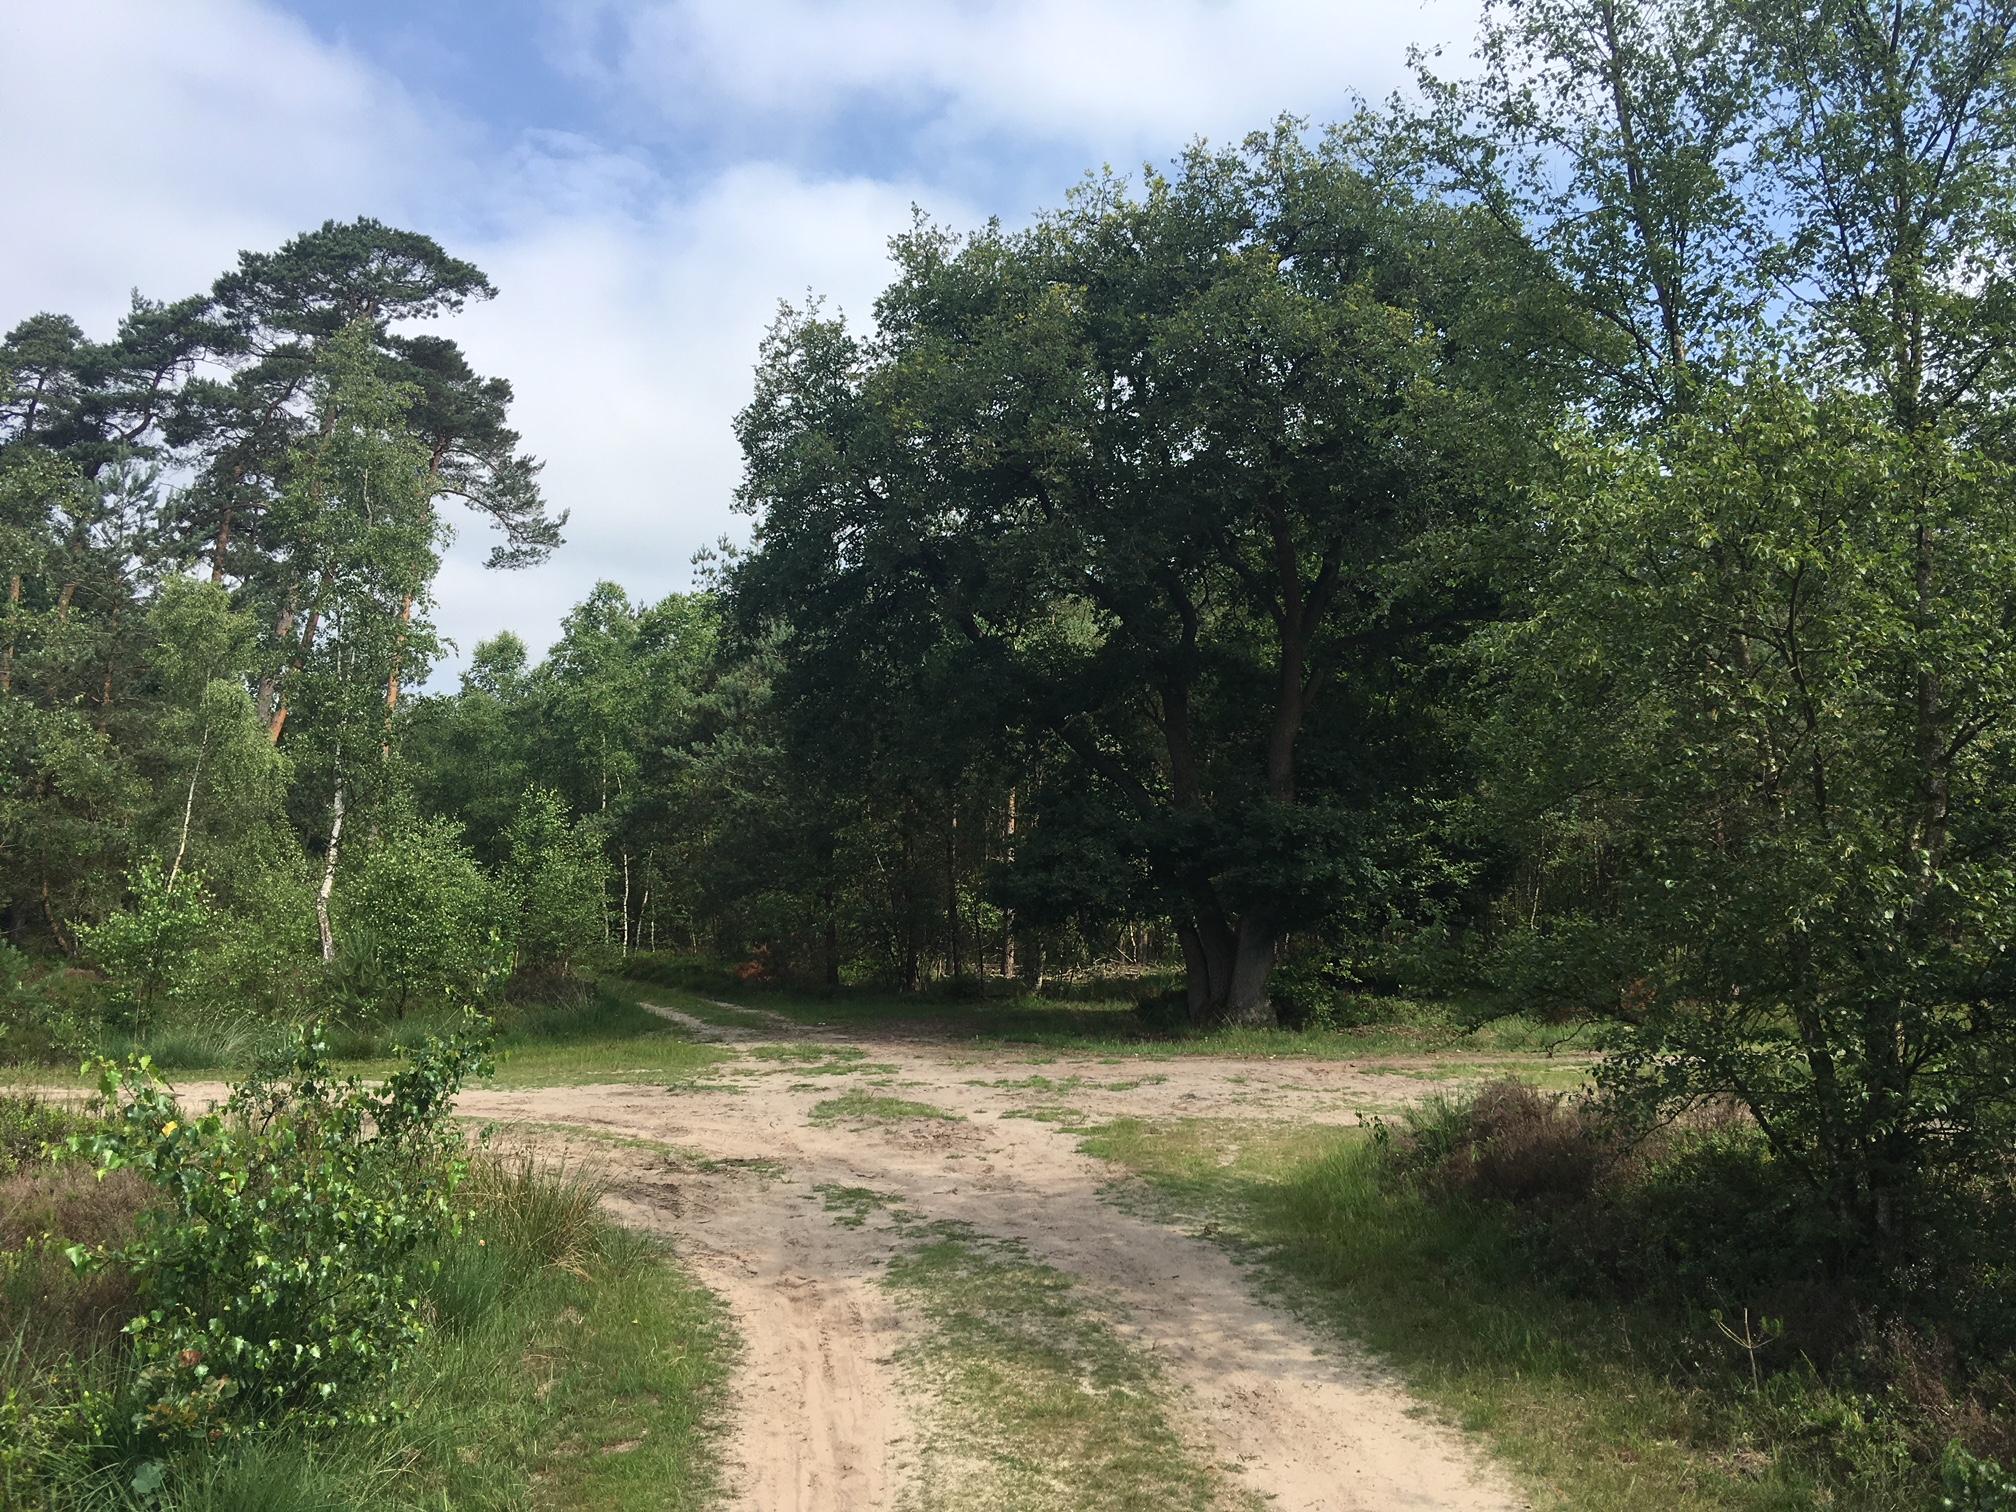 Wandelroute 10 km Veluwe